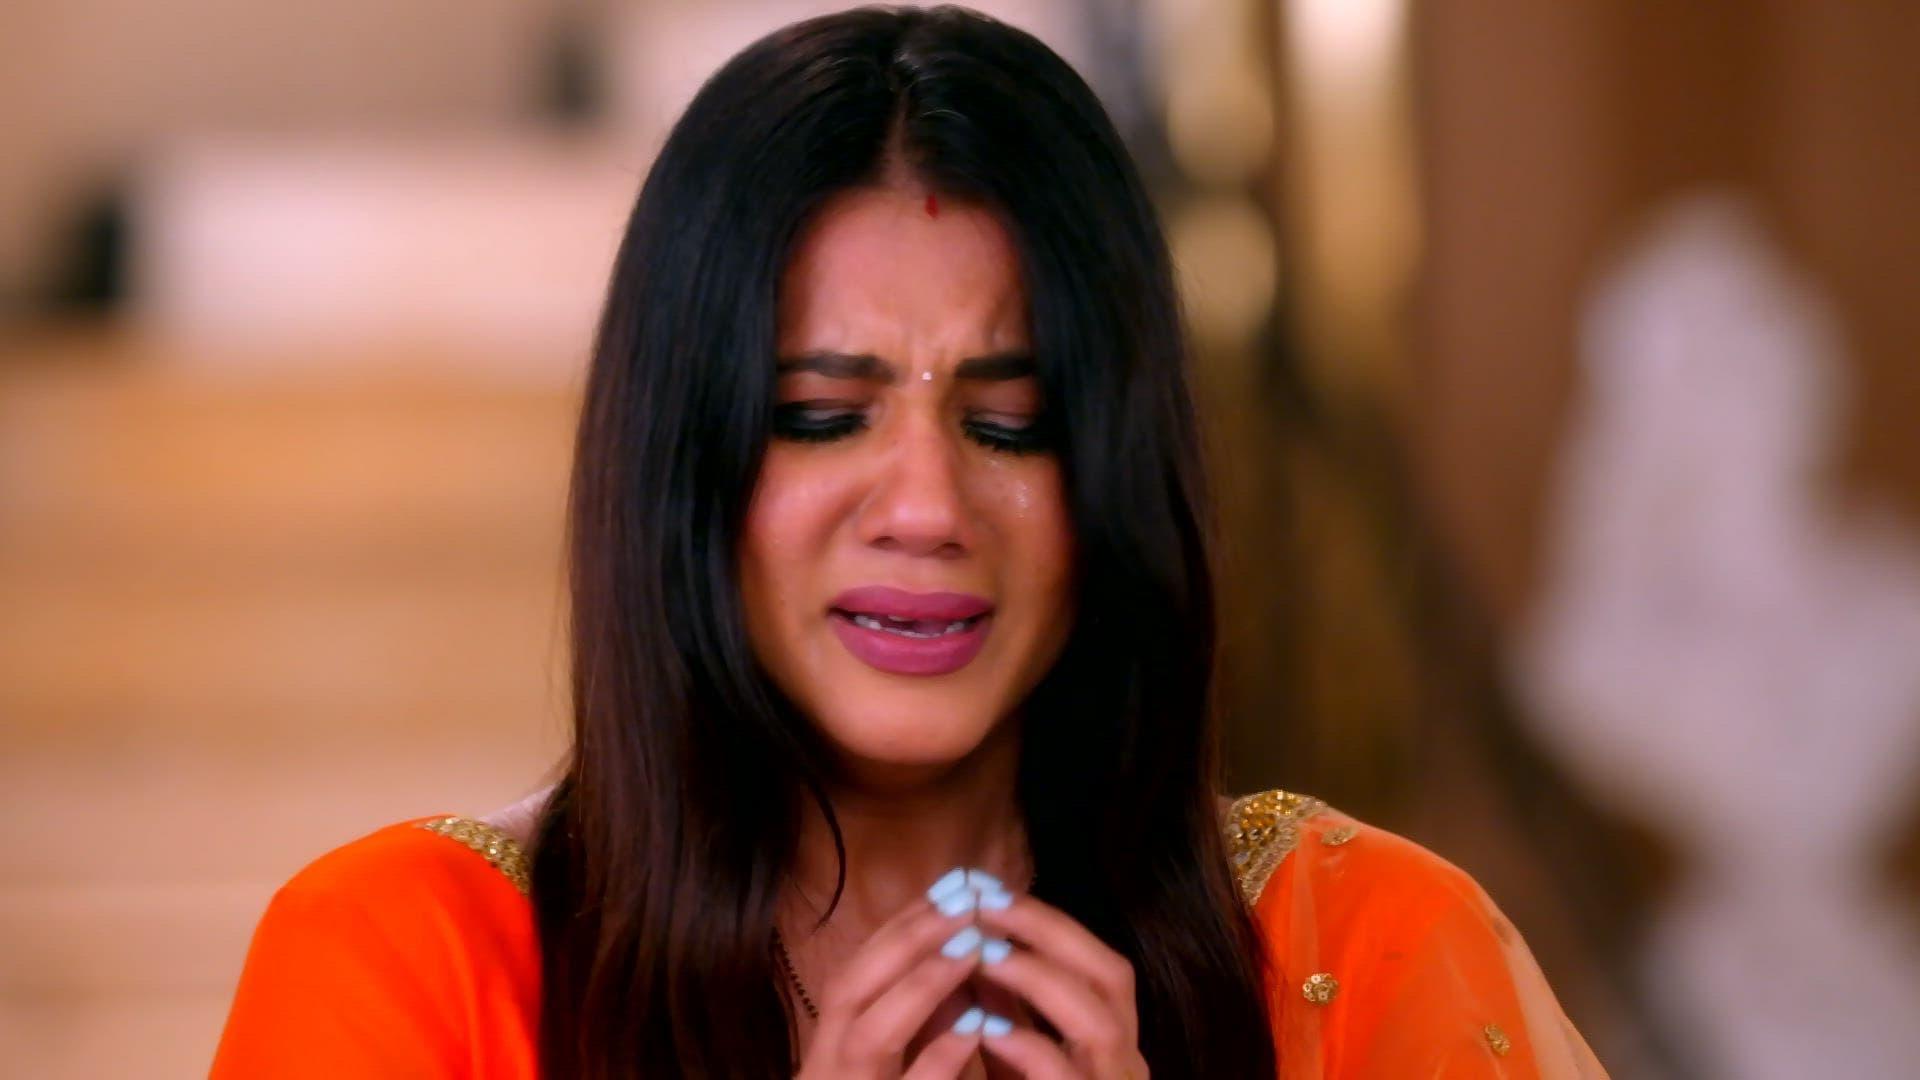 Kundali Bhagya 23 April 2021 Written Update: Kritika reveals how Akshay was blackmailing her